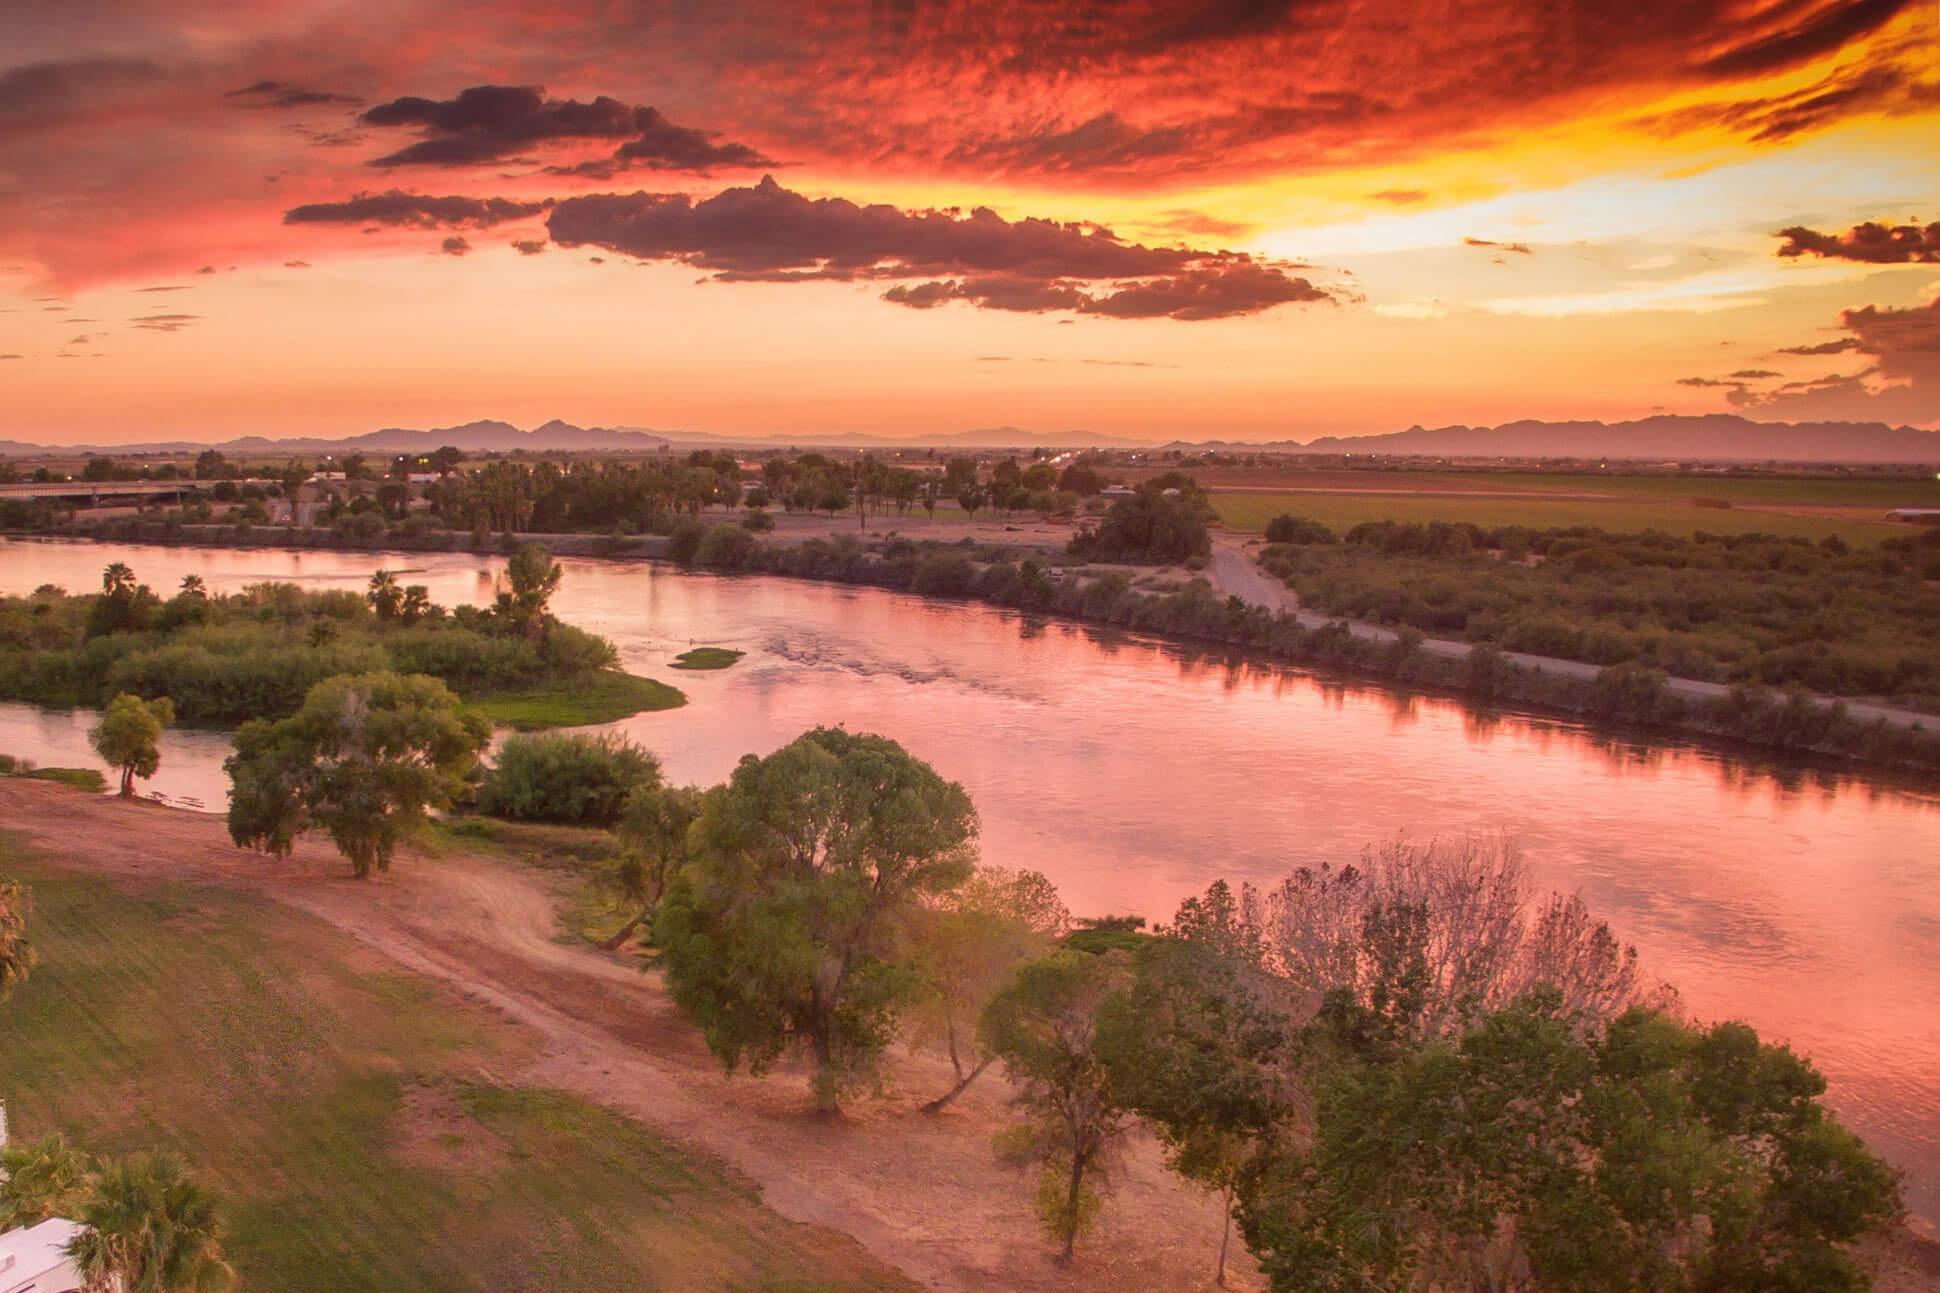 rv-sites-colorado-river-sunset.jpg